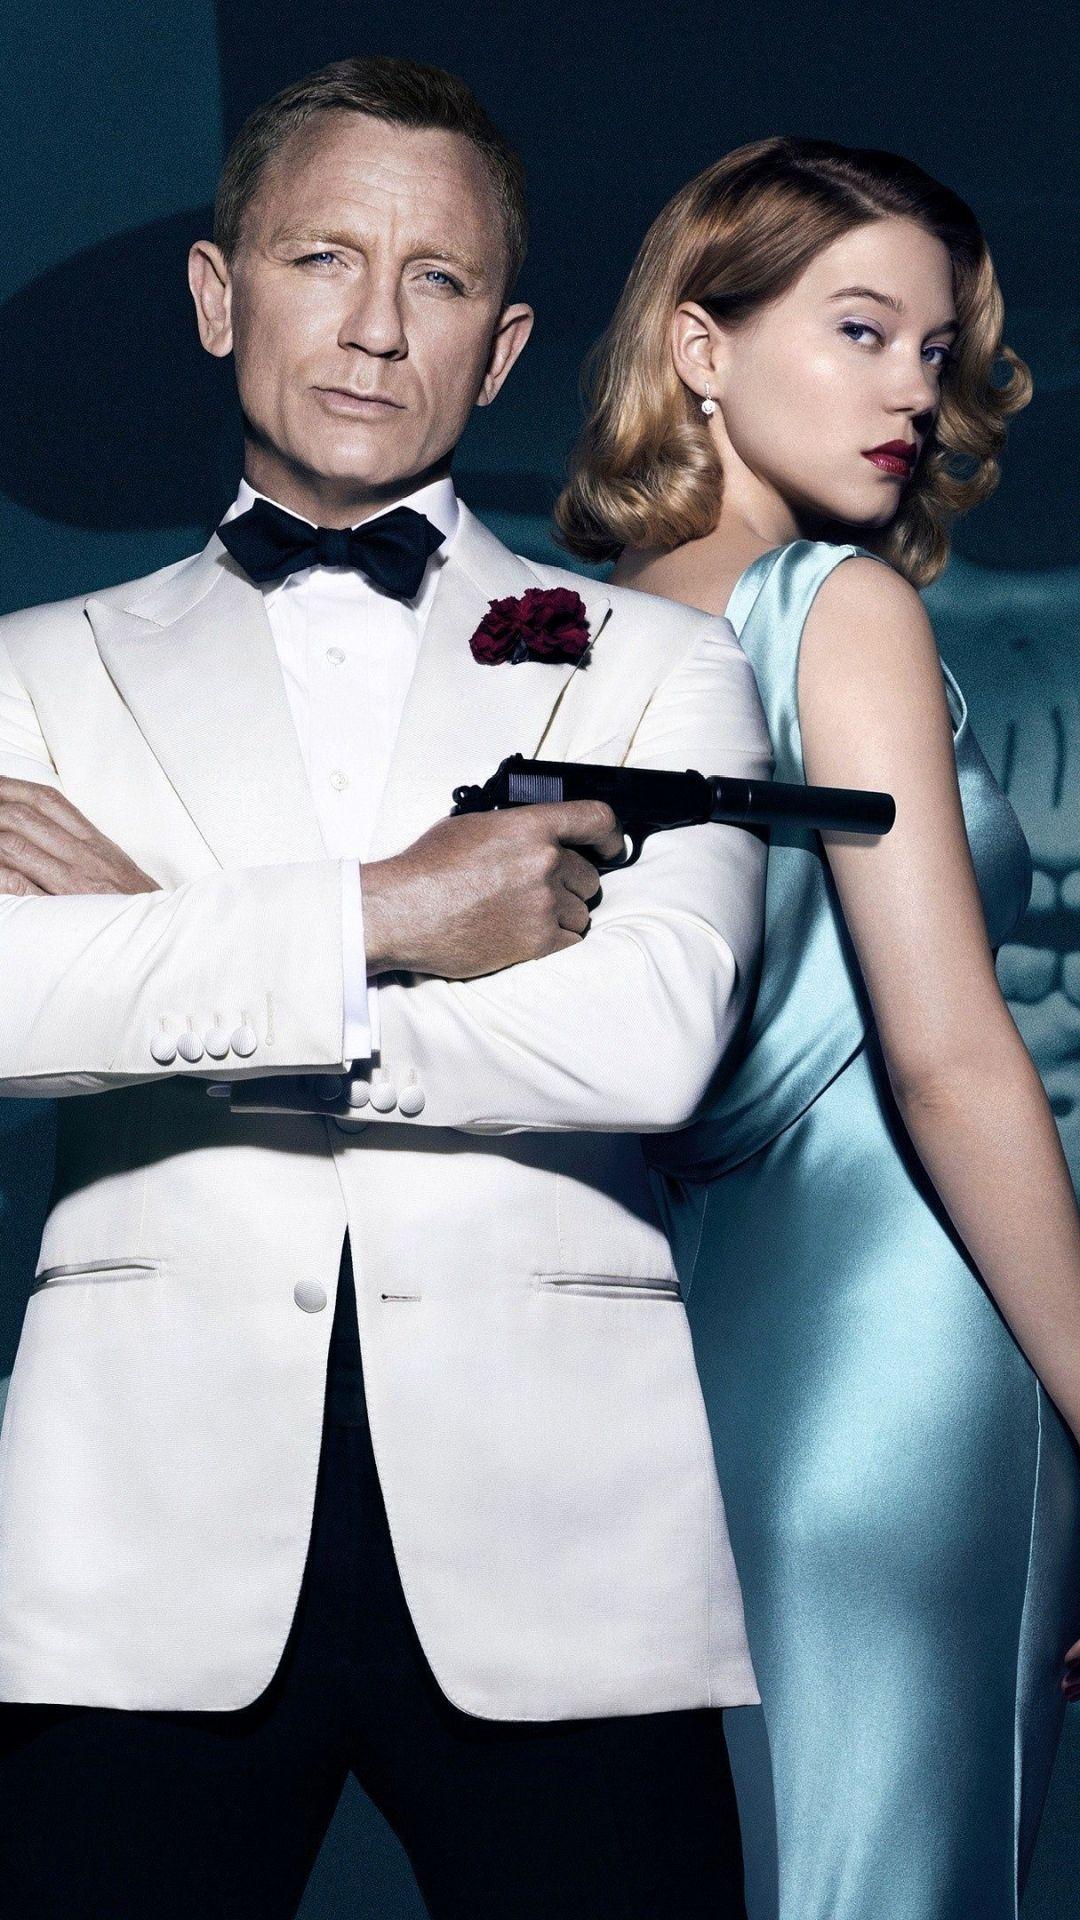 Suit James Bond Daniel Craig Skyfall Spy Wallpaper Allwallpaper James Bond Movie Wallpapers Grad Photoshoot